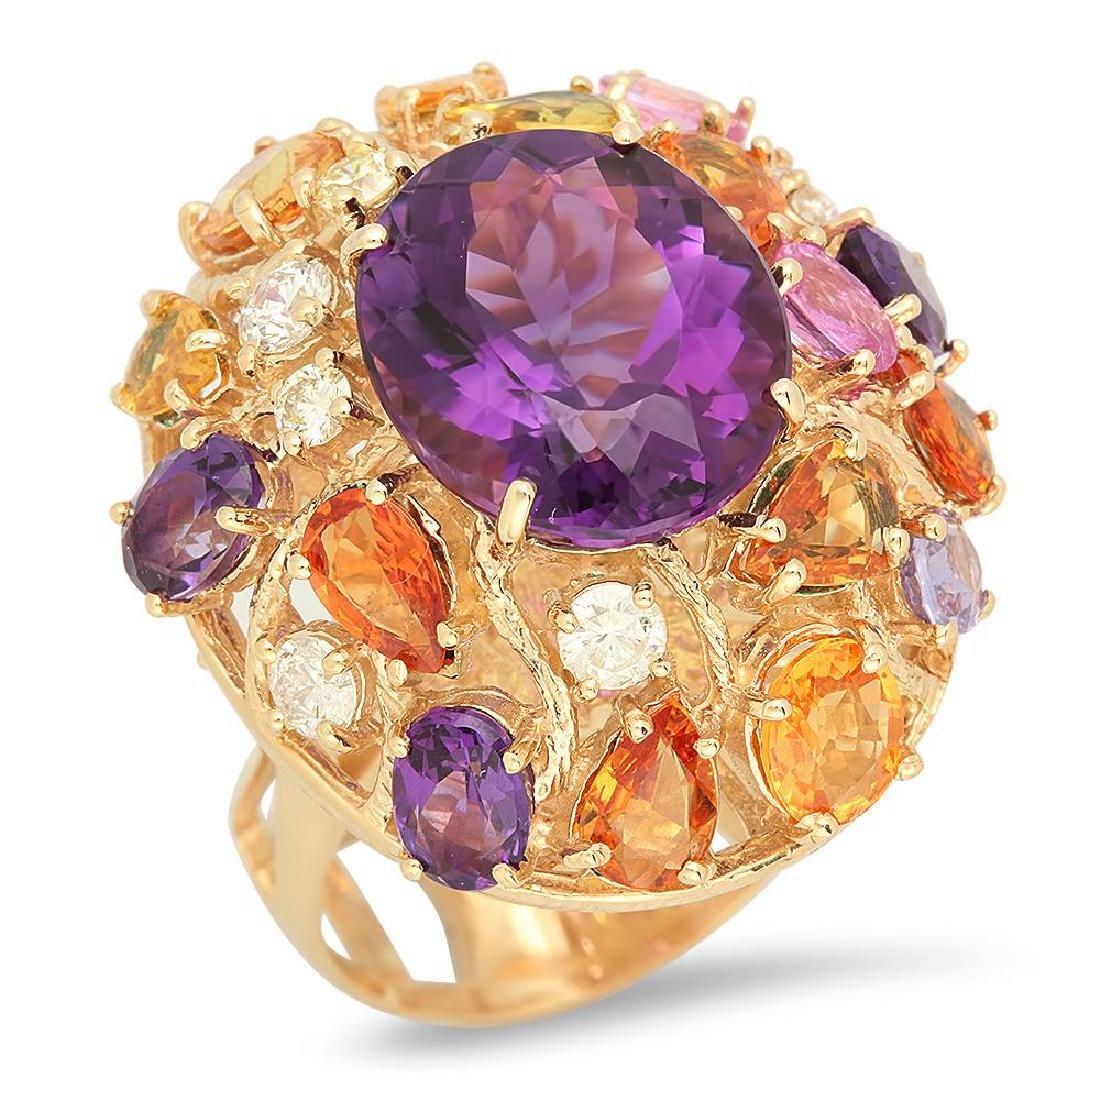 14K Gold 8.26ct Amethyst 6.46ct Sapphire 0.7cts Diamond